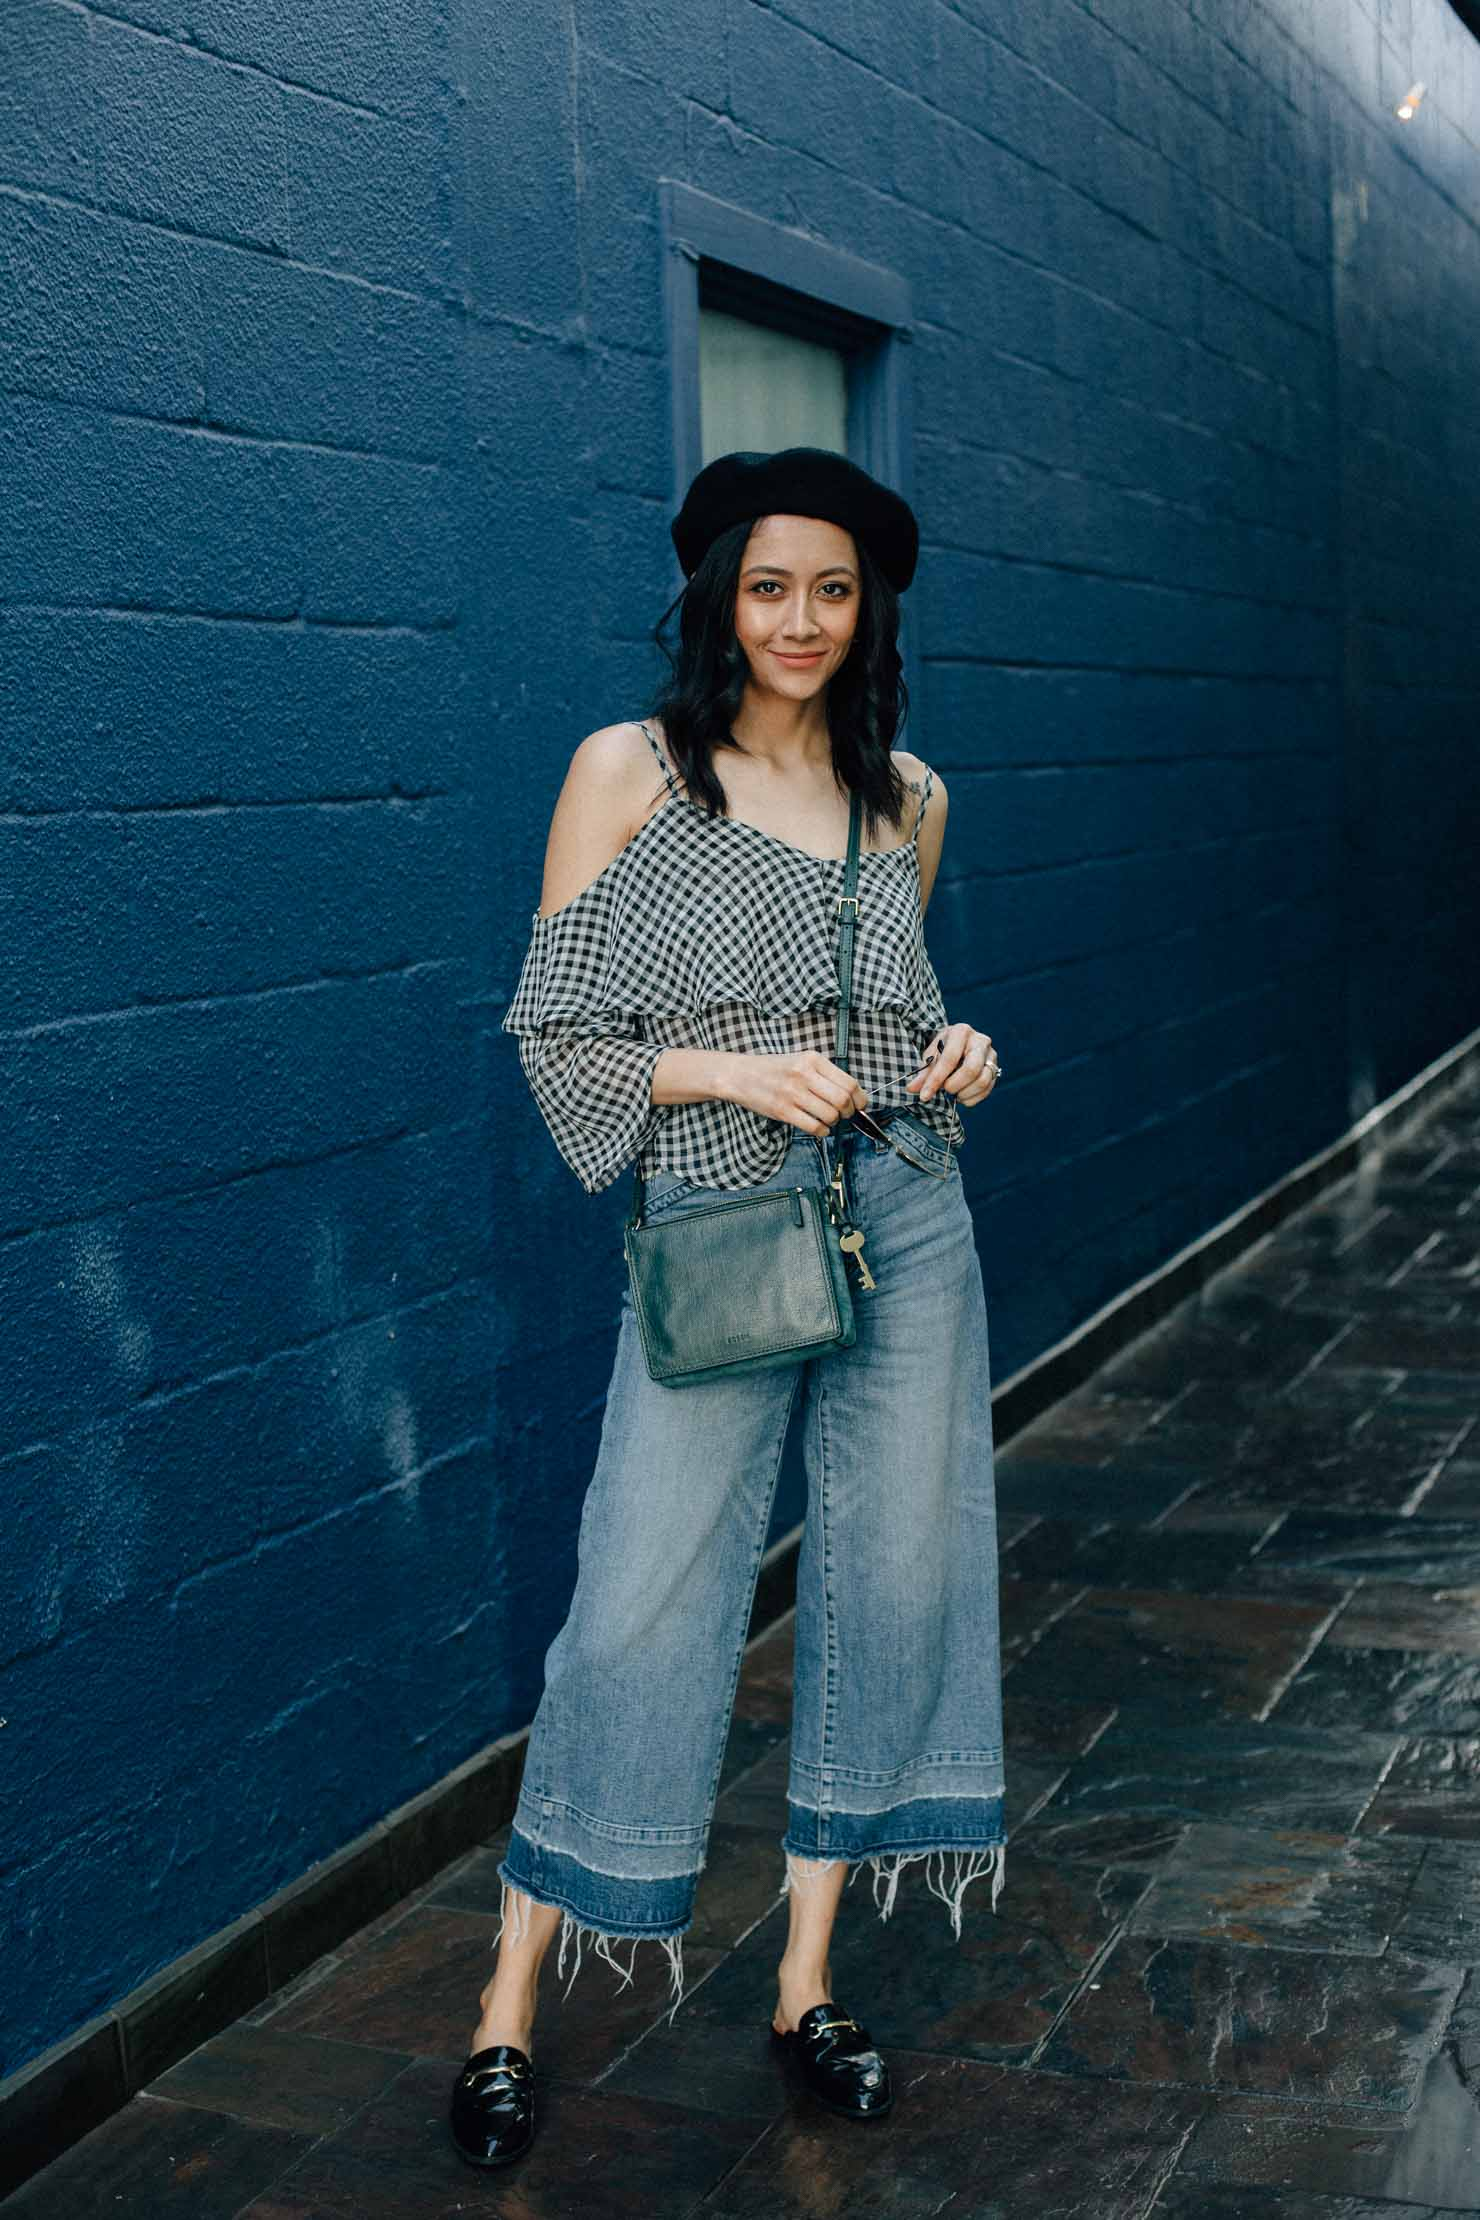 Houston Based Fashion Blogger | Wide Leg Denim | Effortless Style | Gingham Top